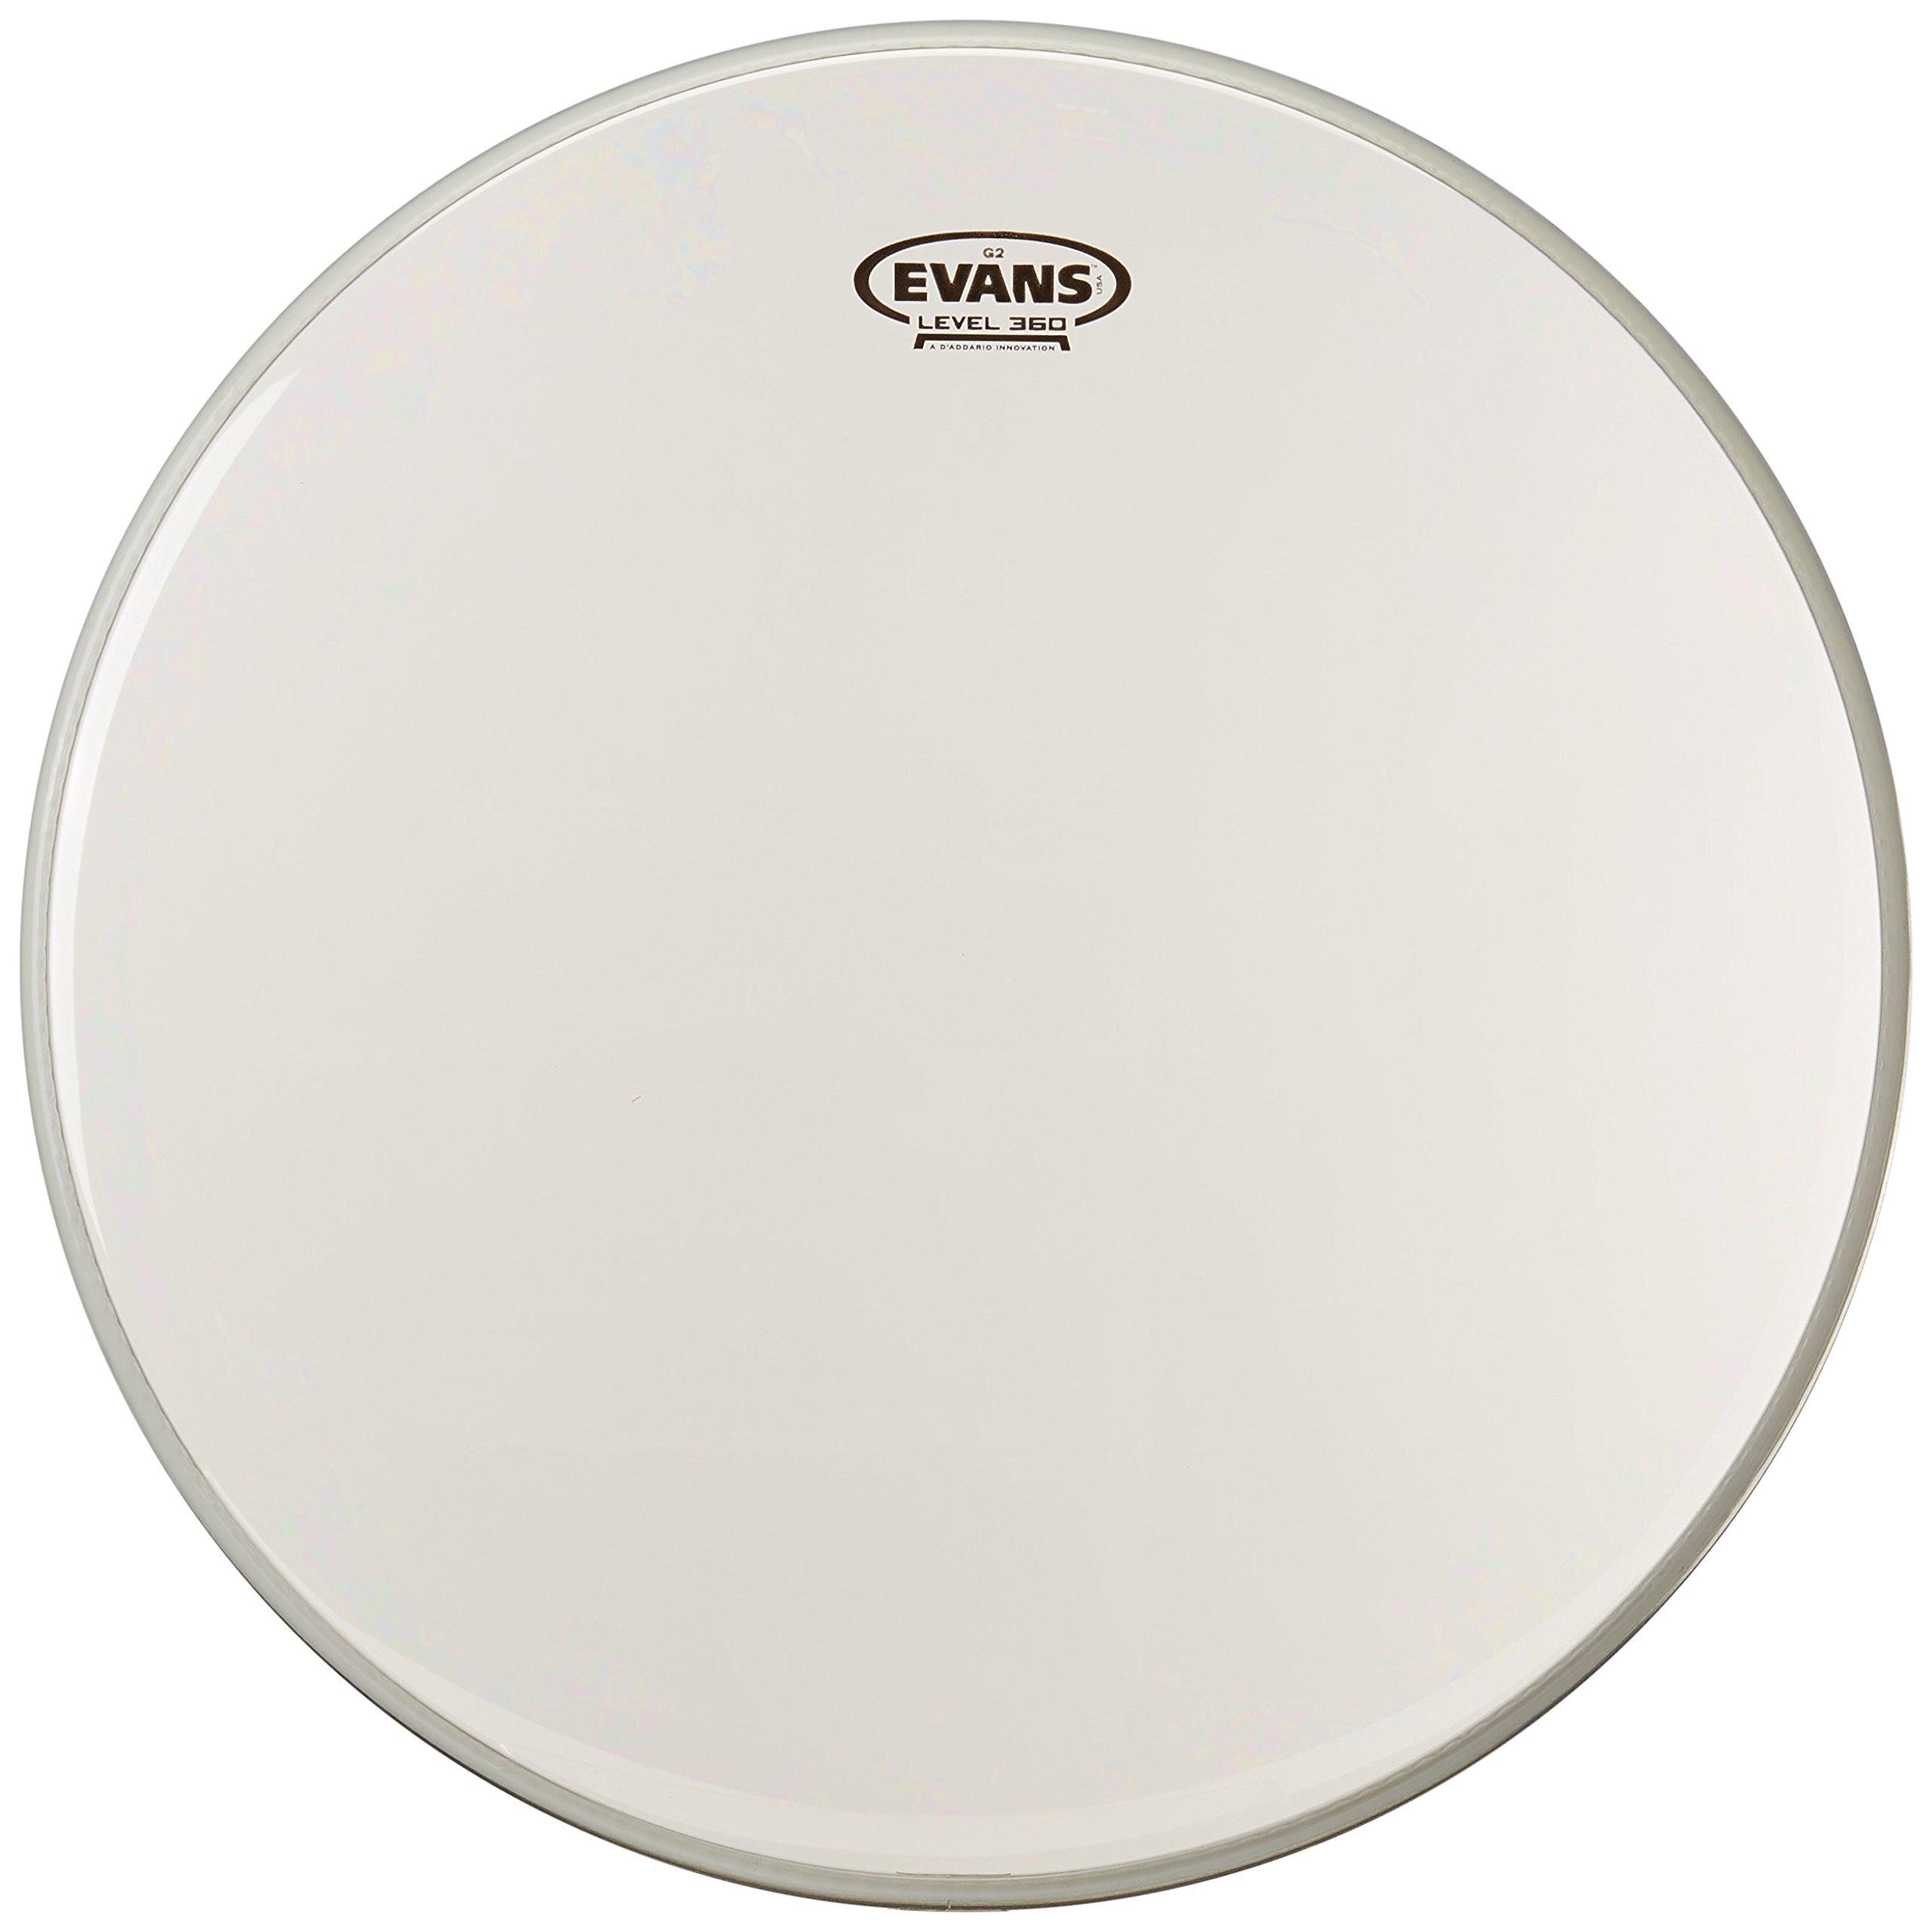 Evans G2 Clear Bass Drum Head, 20 Inch